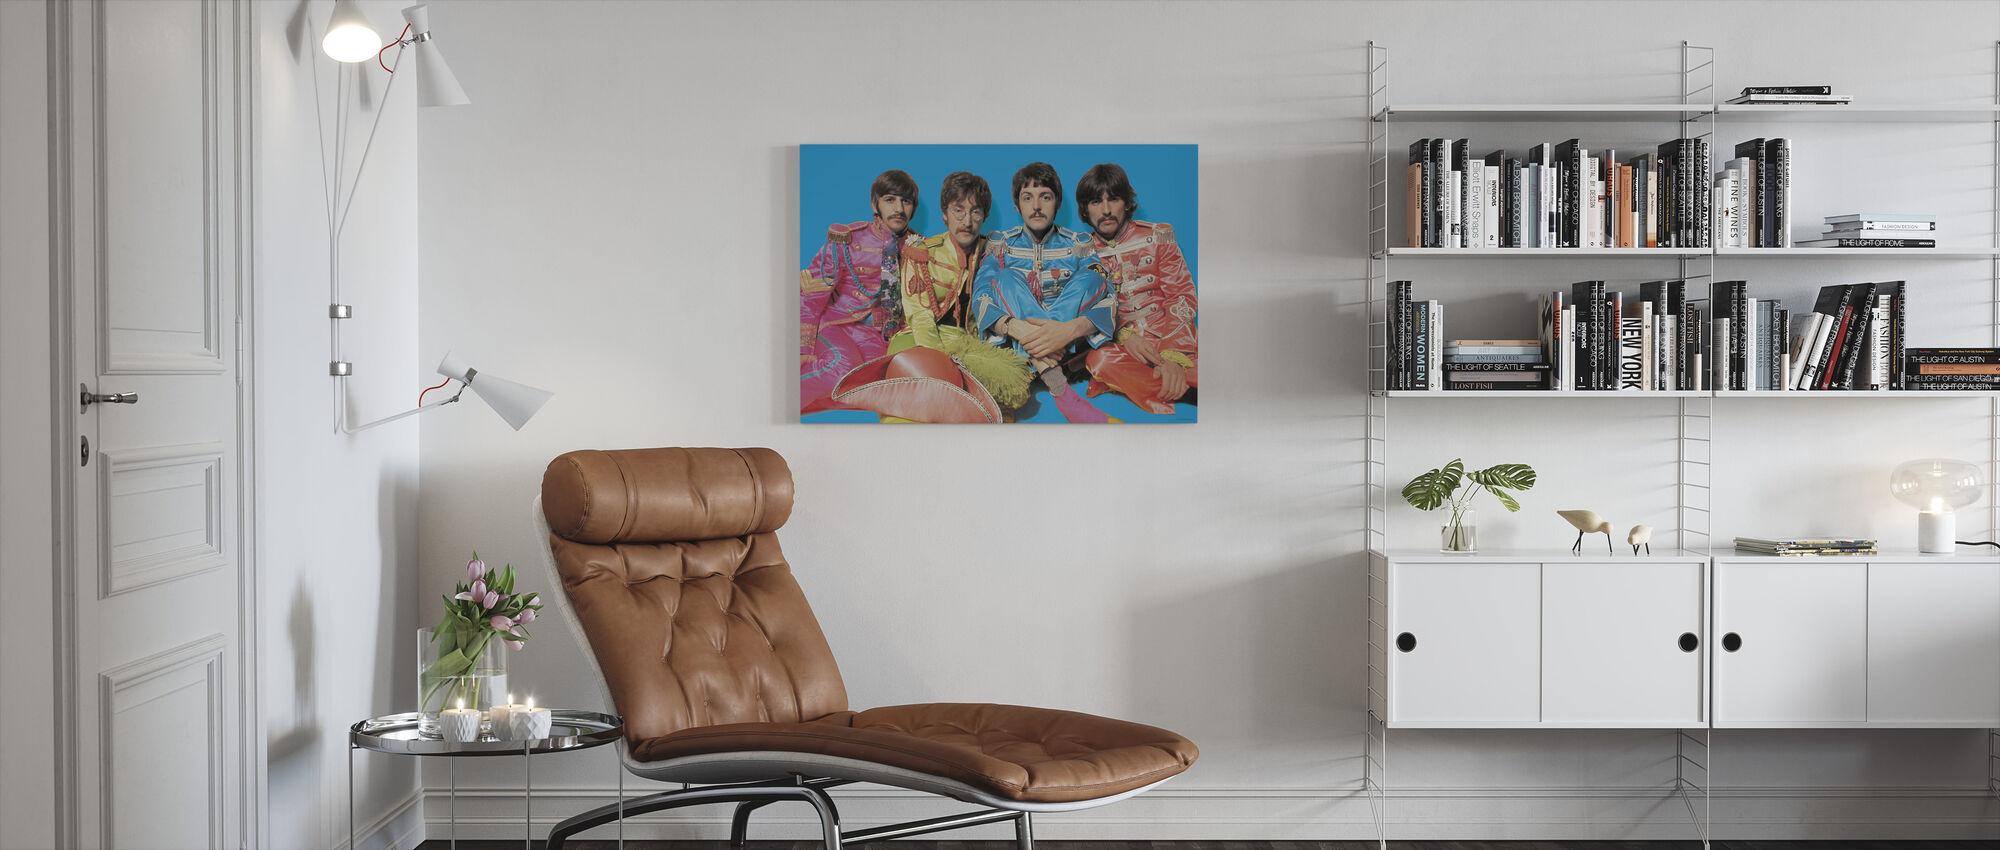 Beatles - Kersantti Pepperit Yksinäiset sydämet Club Band - Canvastaulu - Olohuone